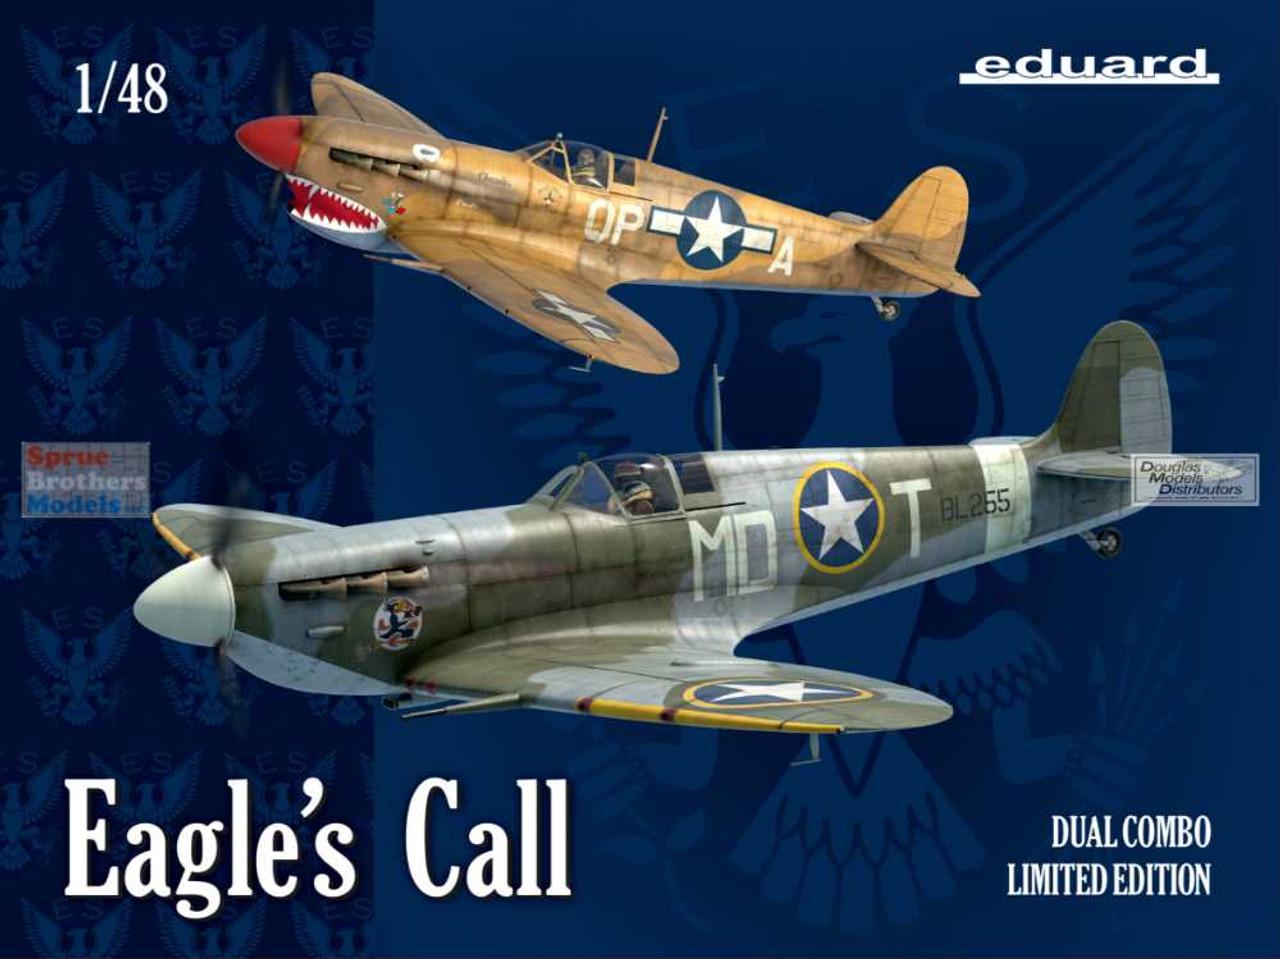 EDU11149 1:48 Eduard Eagle's Call (Spitfire Vb and Spitfire Vc)